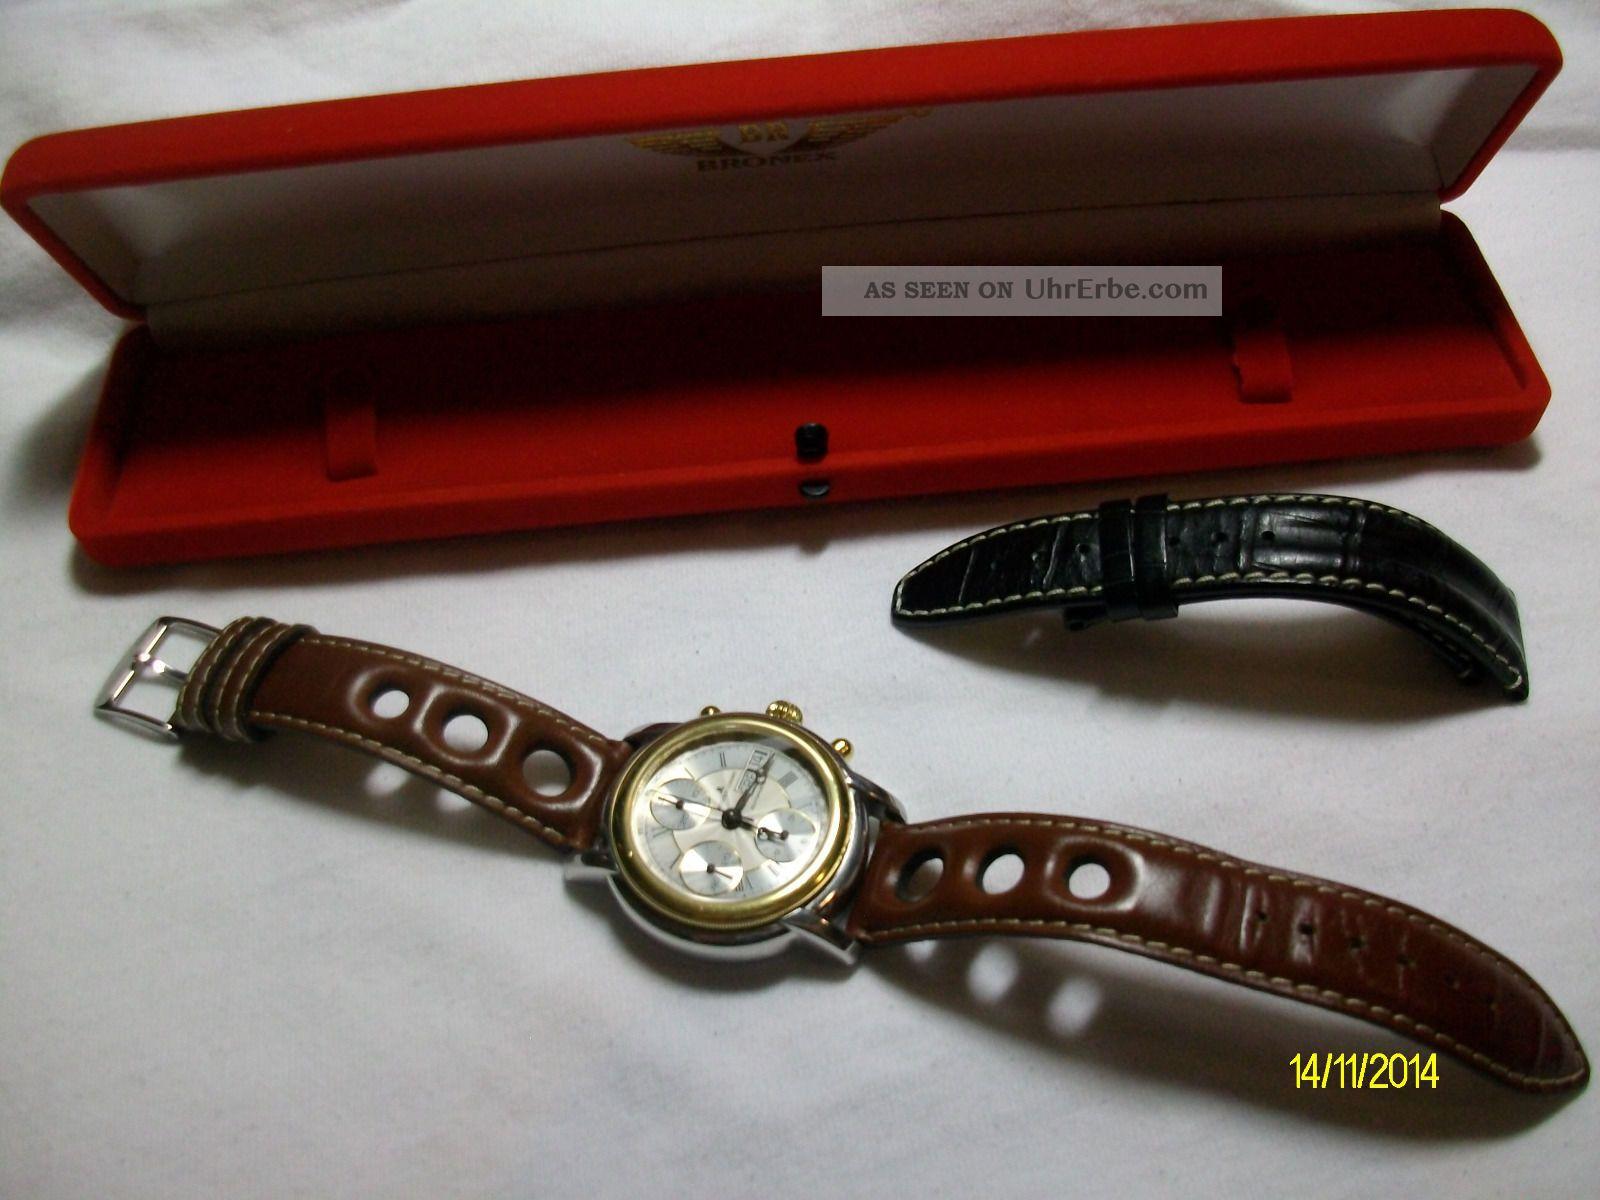 Jacques Lemans Edel Chrono Kaliber 7750 Armbanduhren Bild